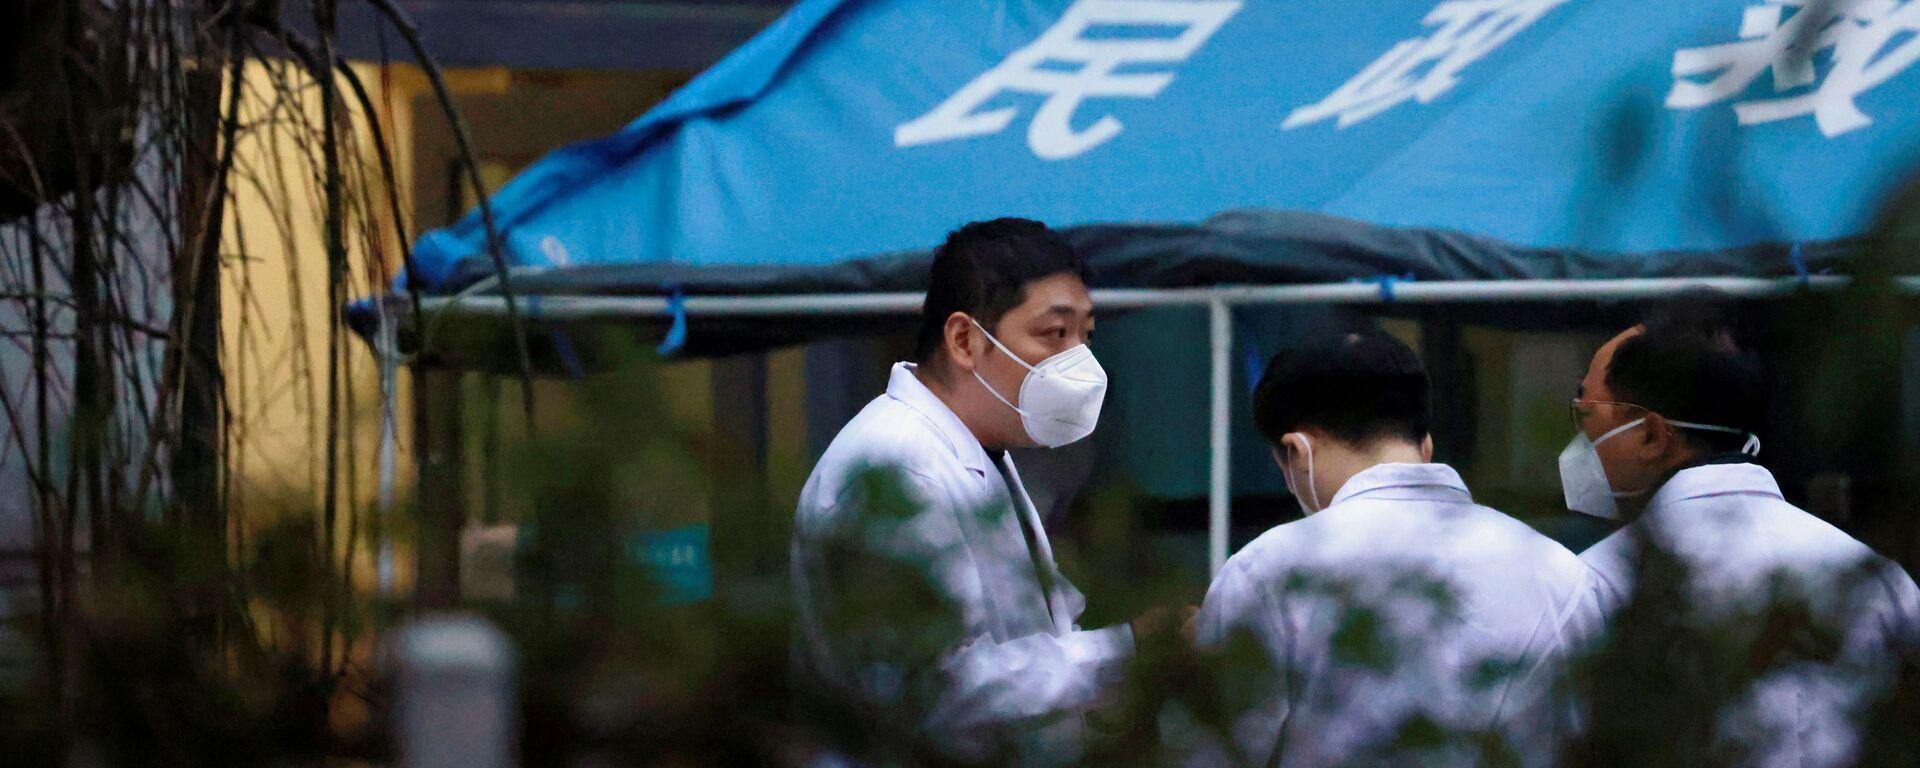 Expertos de la OMS en hospital de Wuhan - Sputnik Mundo, 1920, 30.01.2021